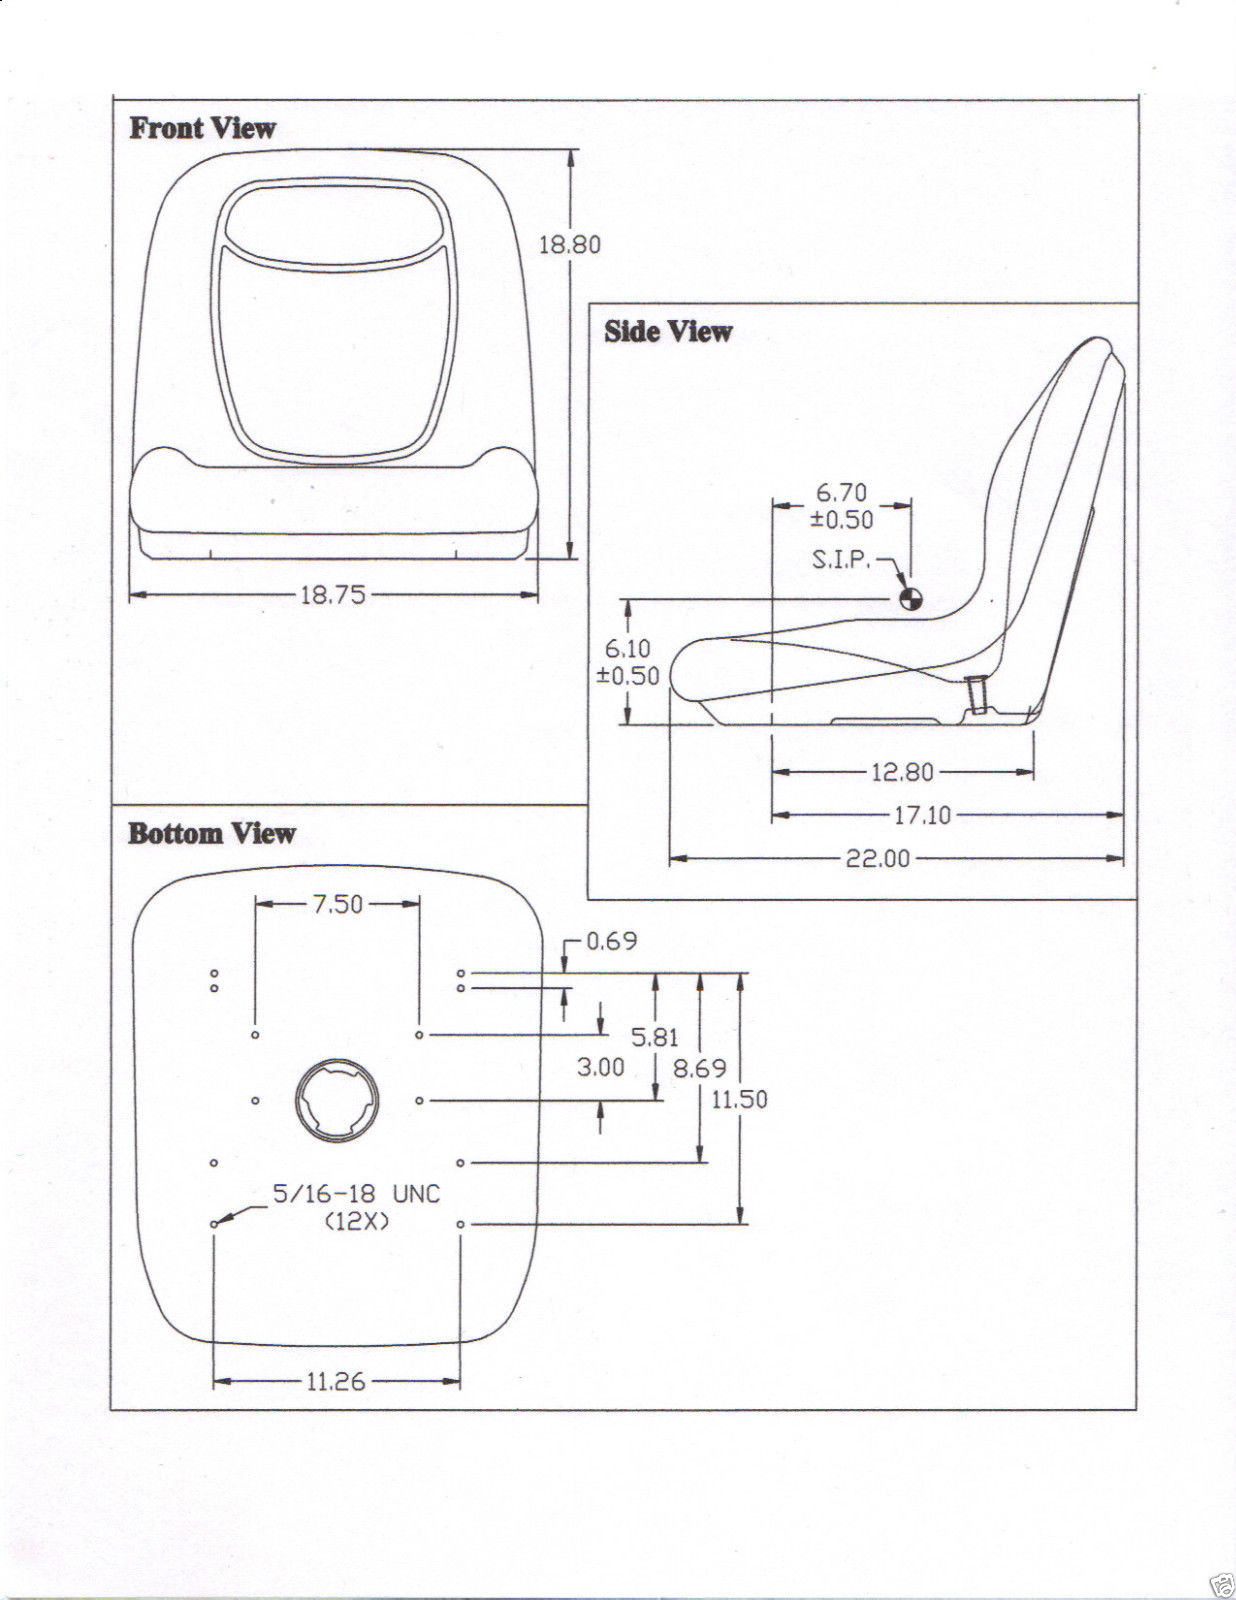 Toro Z Master Wiring Diagram - Roslonek.net